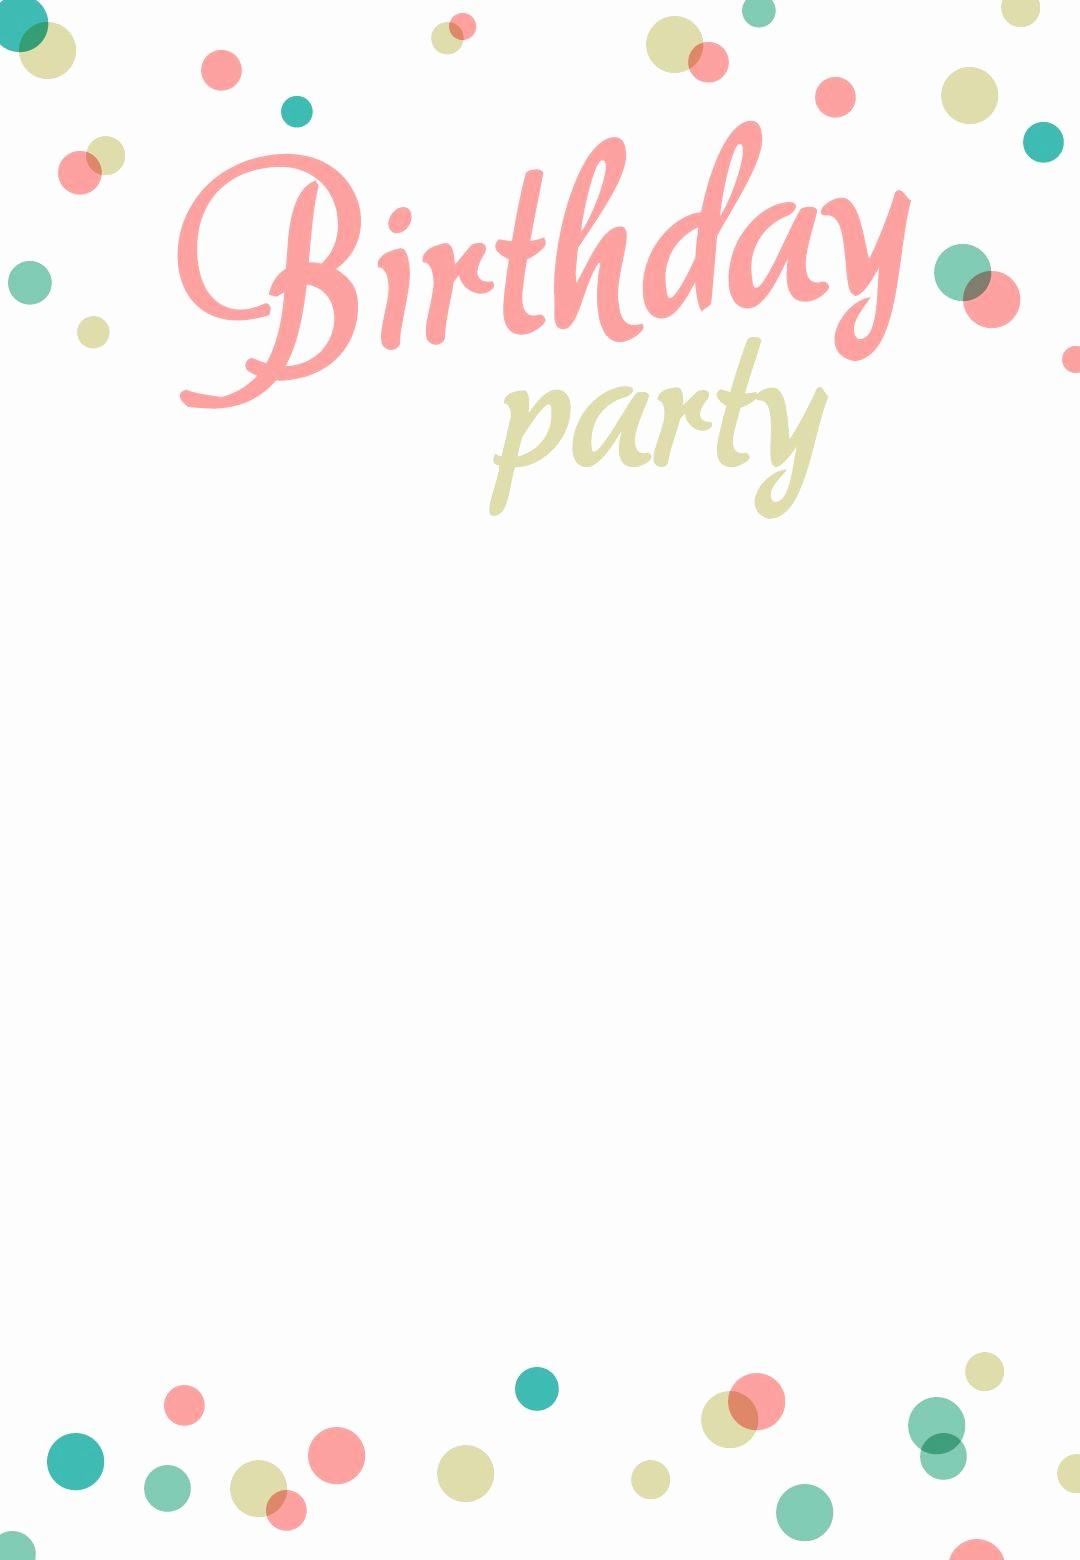 Free Templates for Birthday Invitations Luxury Birthday Party Invitation Free Printable